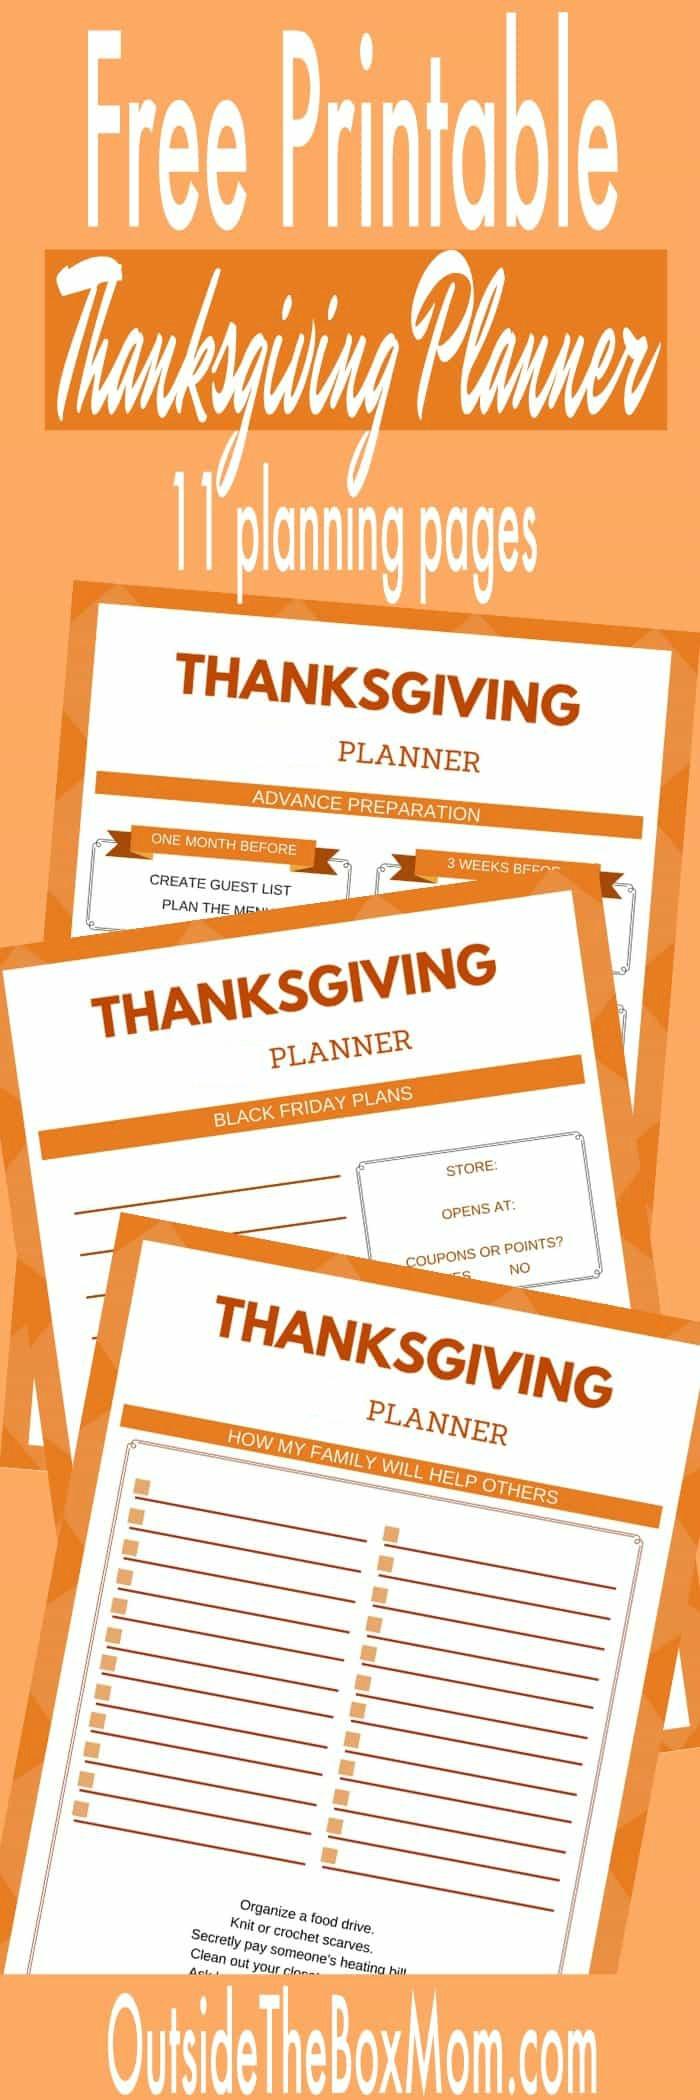 image regarding Thanksgiving Menu Planner Printable named The Best Thanksgiving Planner - Operating Mother Site